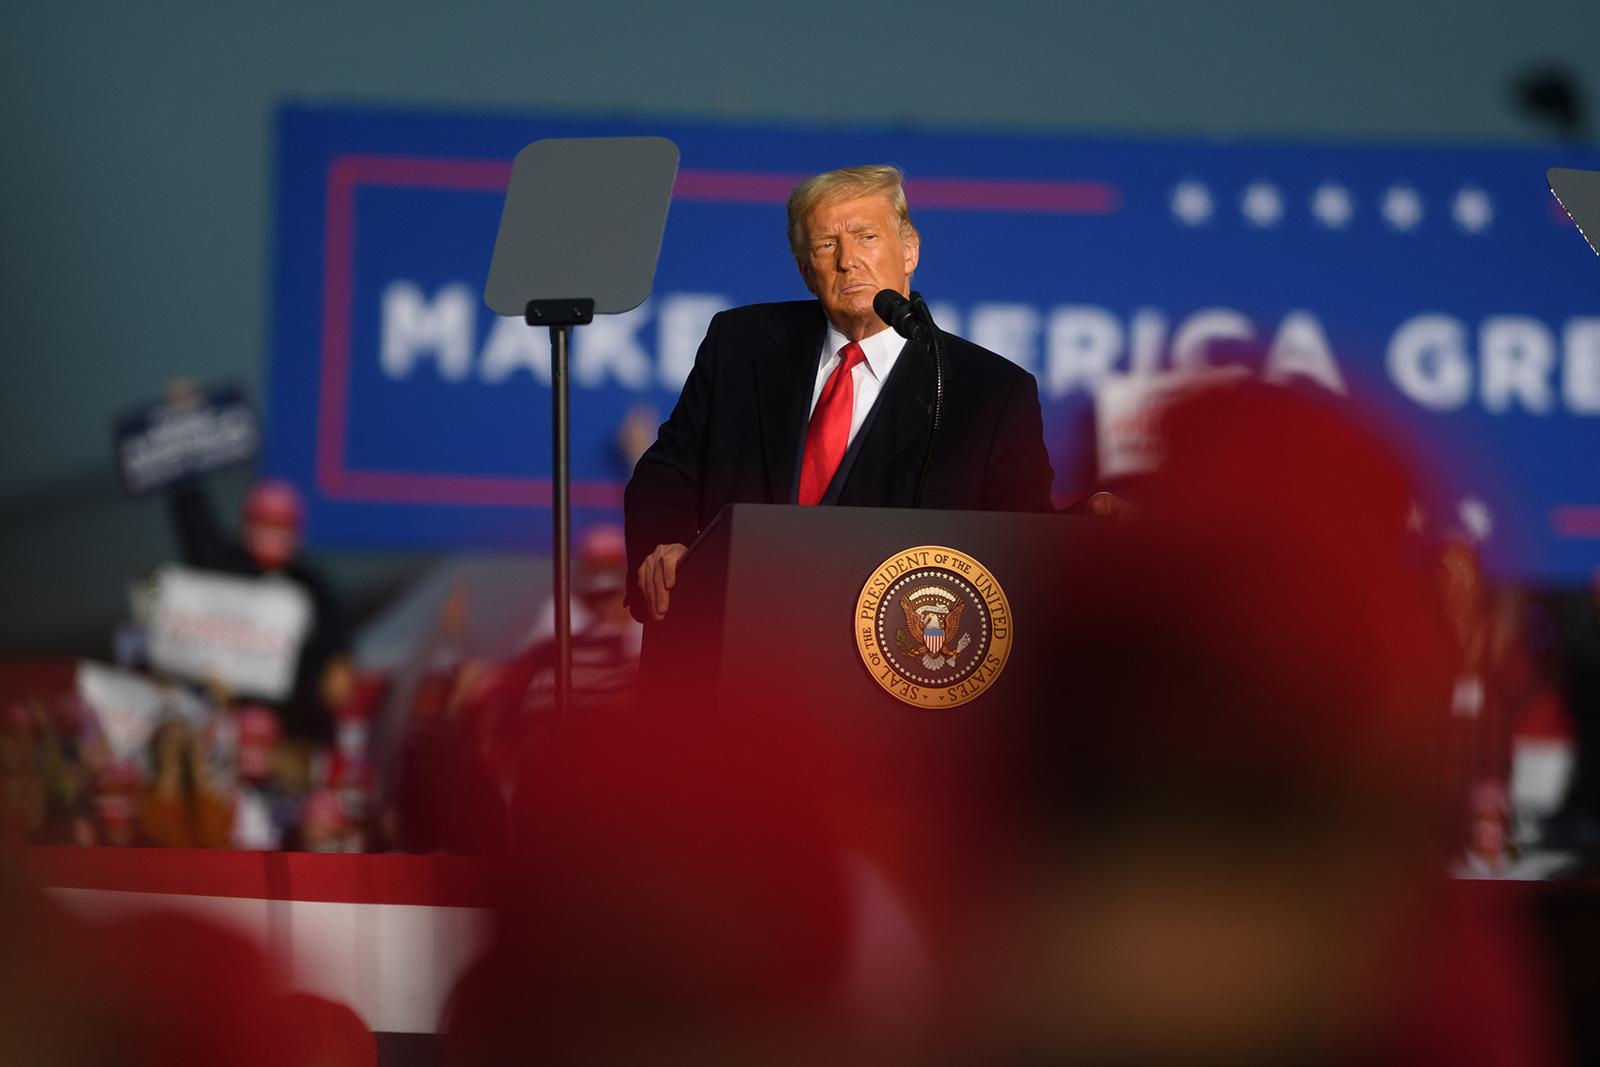 President Donald Trump speaks at a rally at iG Flight Services, in Martinsburg, Pennsylvania, on October 26.